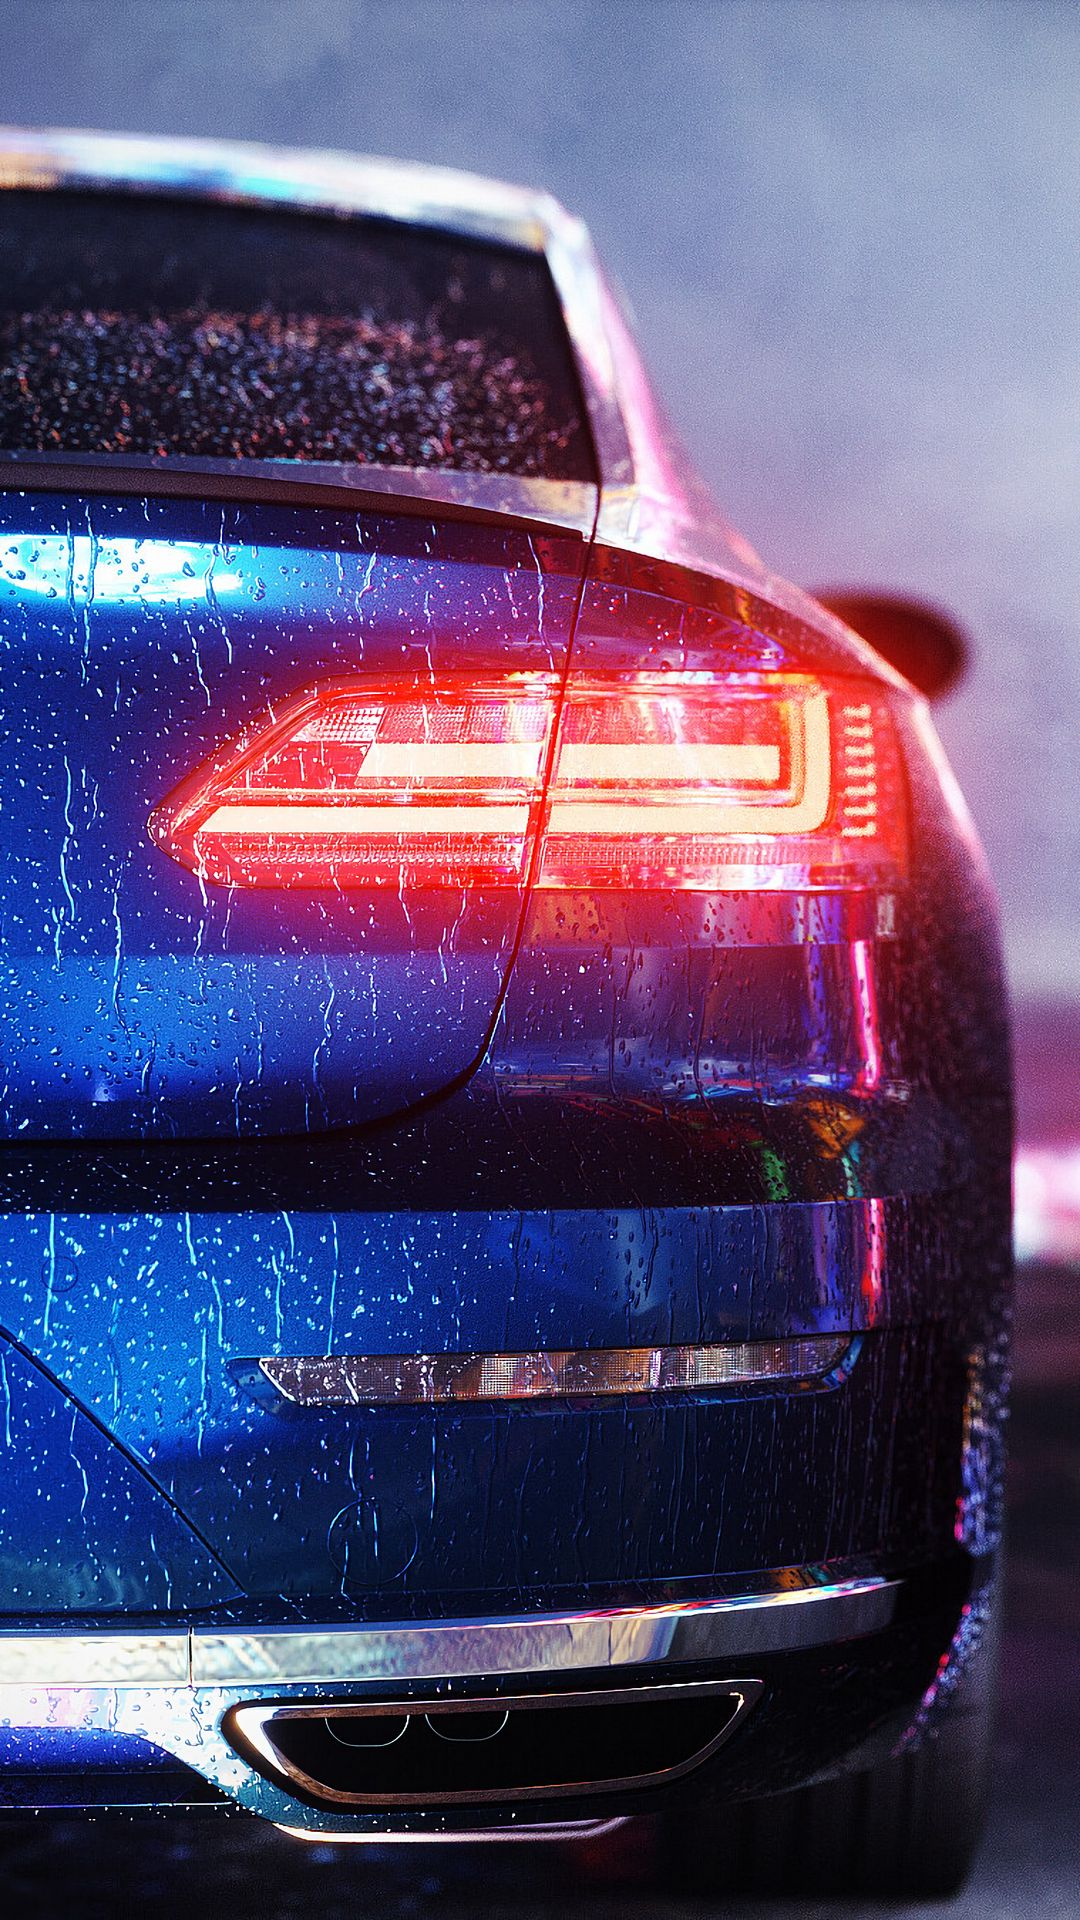 VW Passat Car Stop Wallpapers Free Download